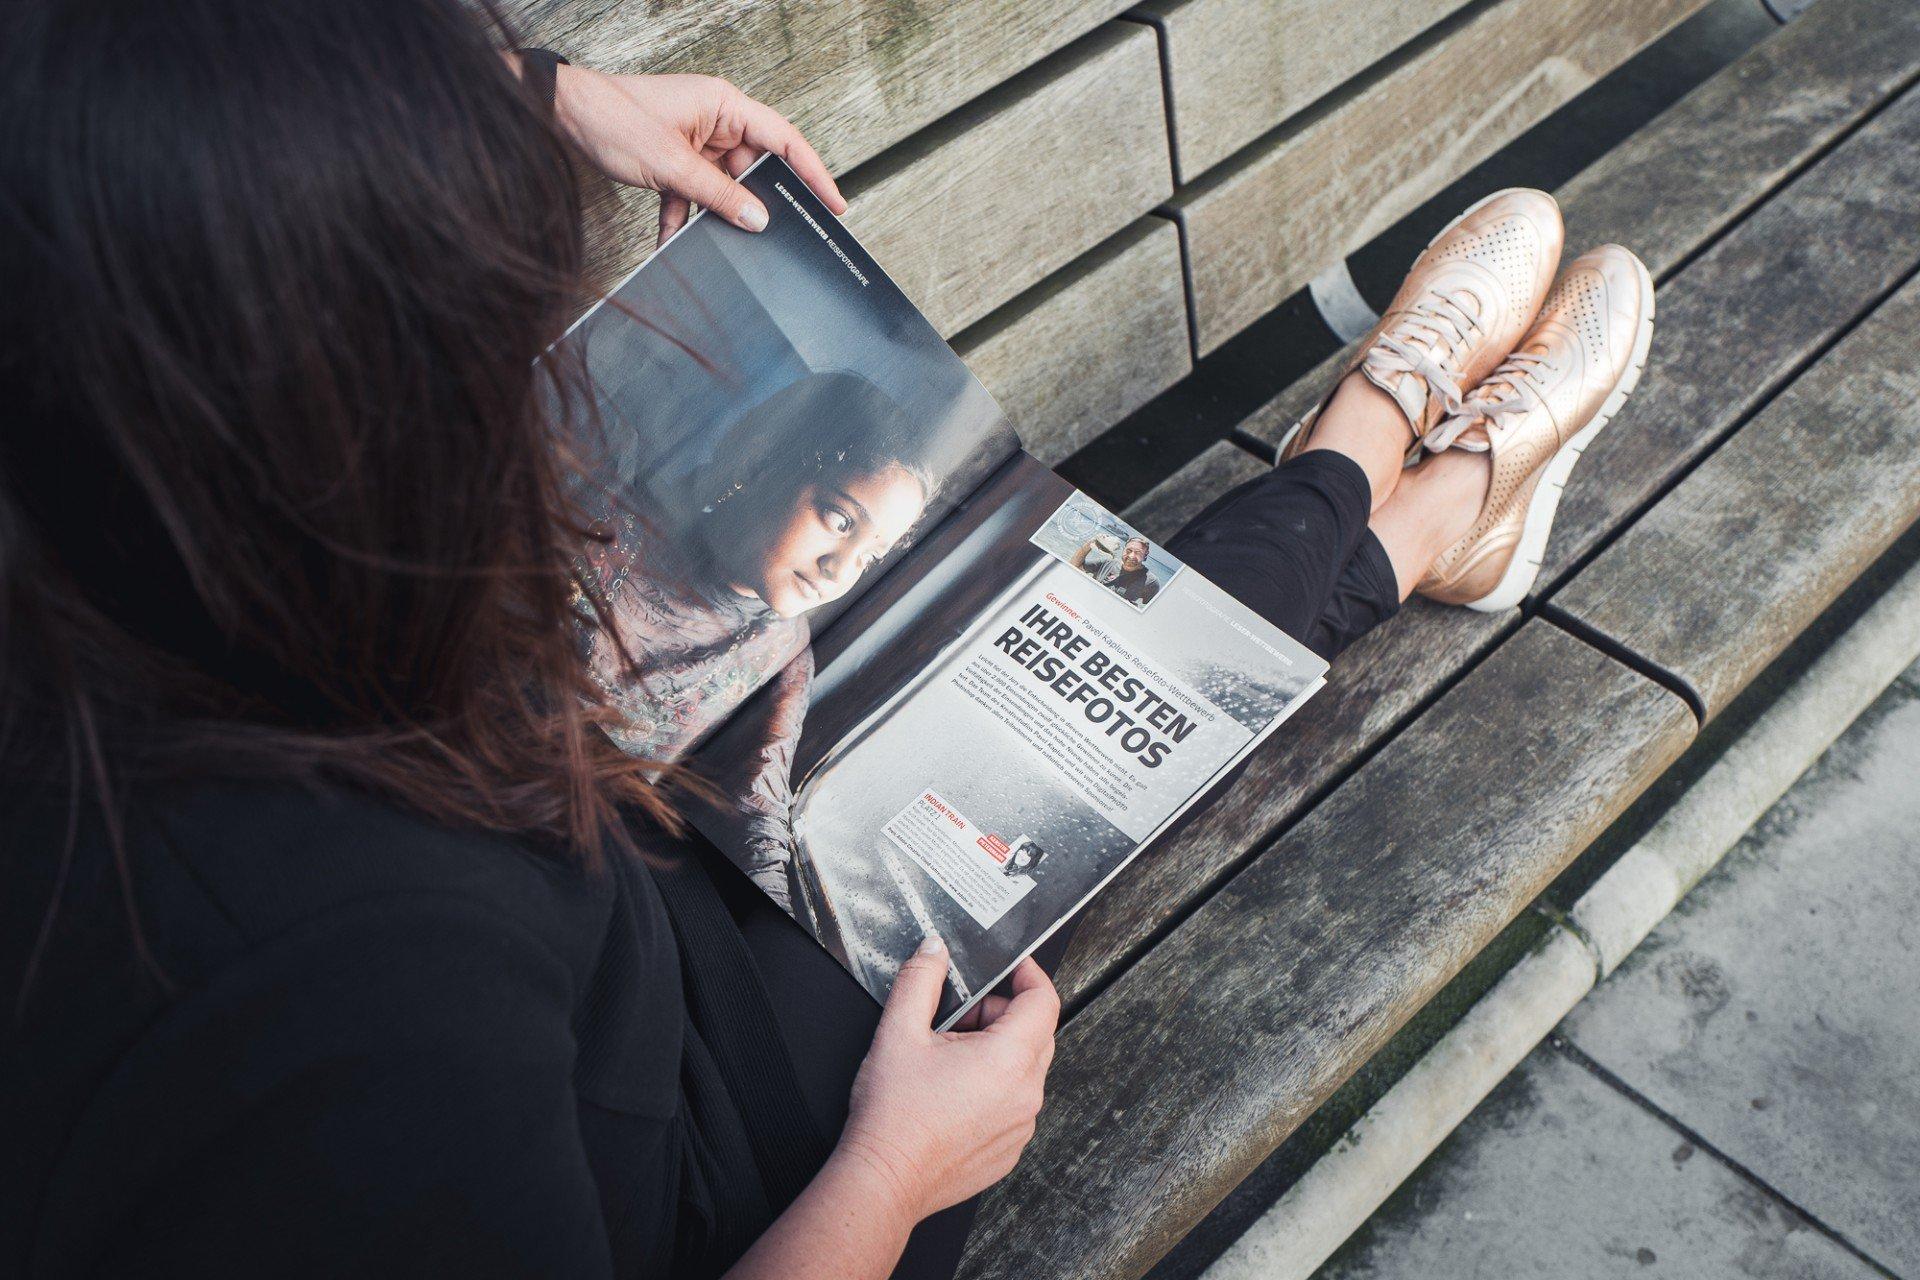 Fotografin Kerstin Petermann blättern im Magazin